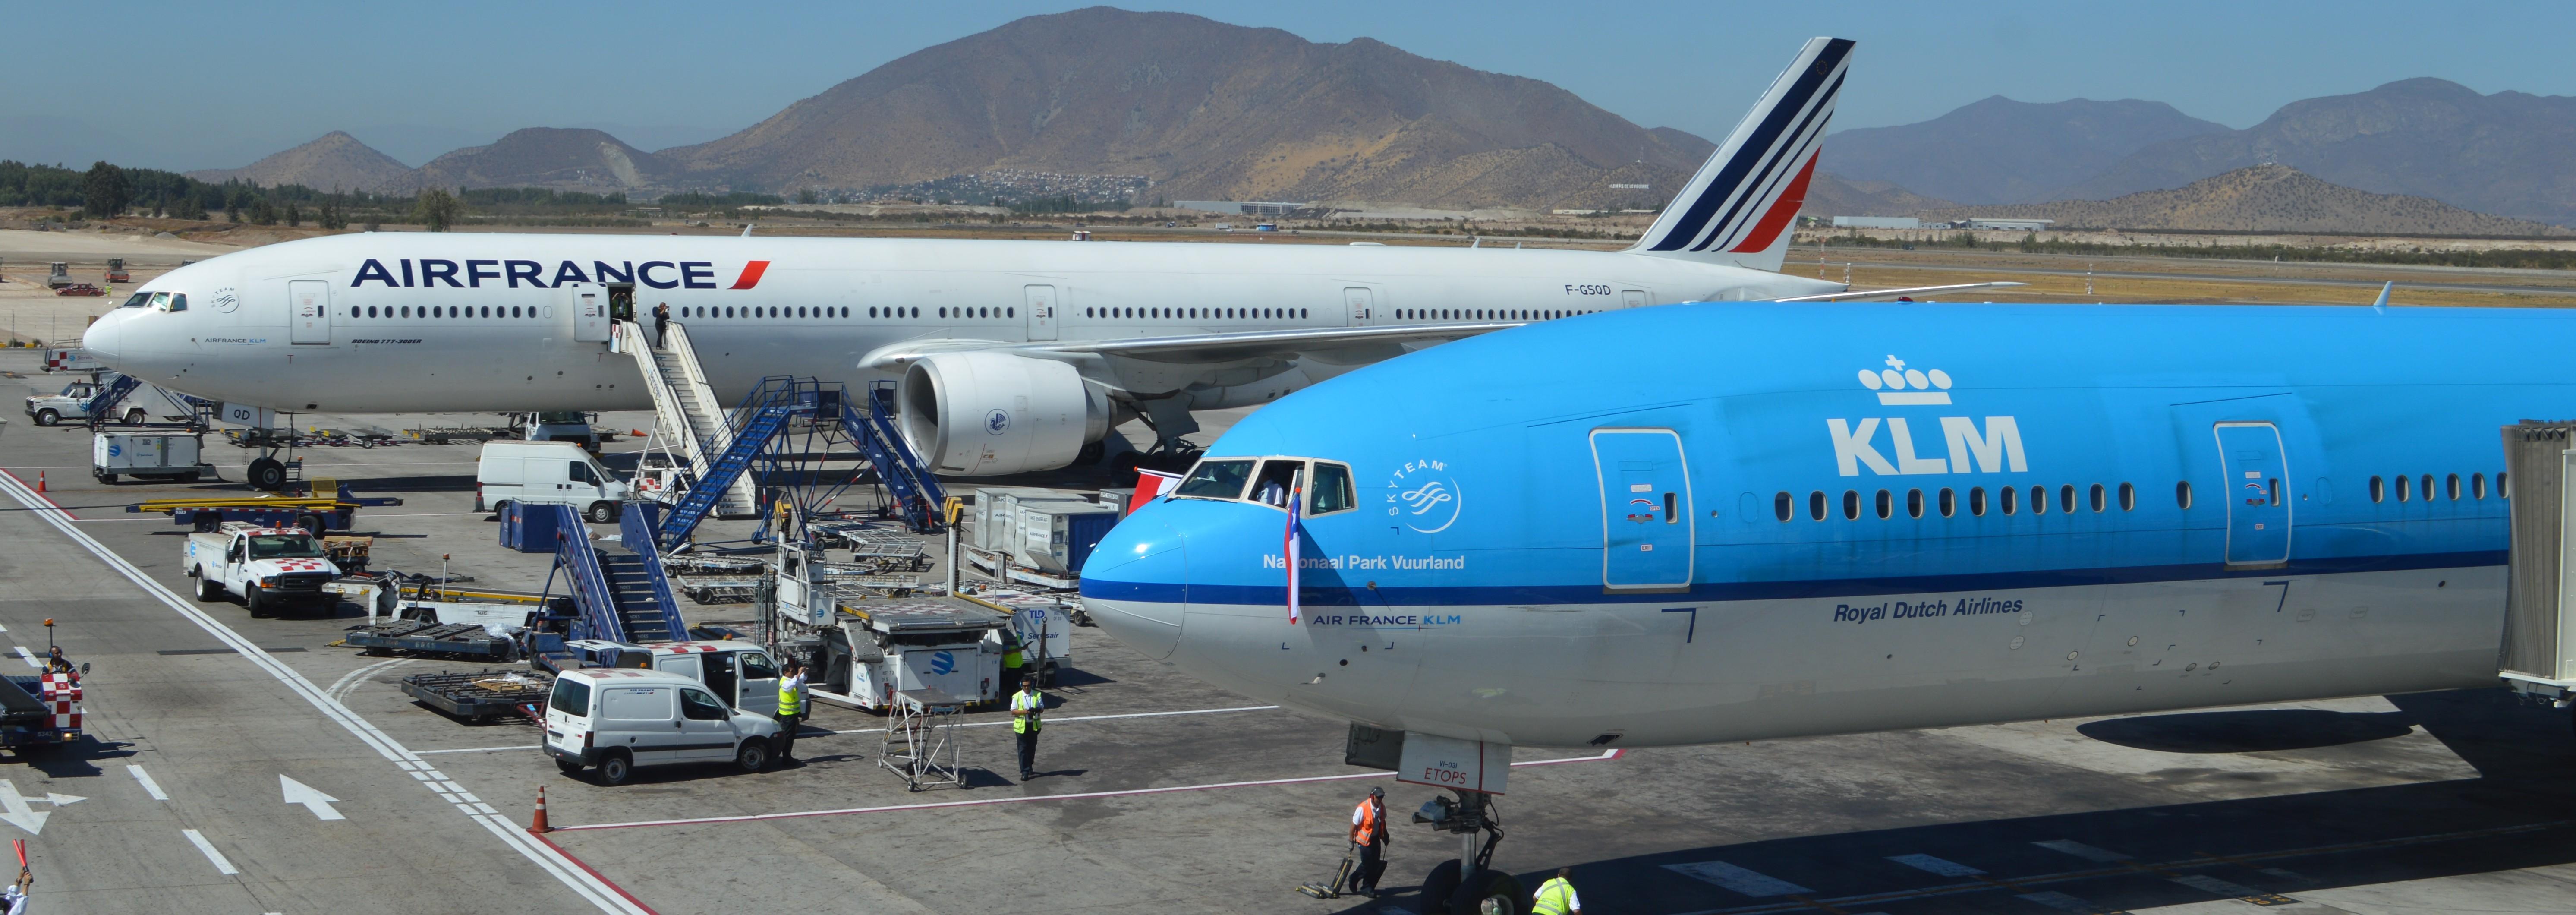 Resultado de imagen para Air France KLM